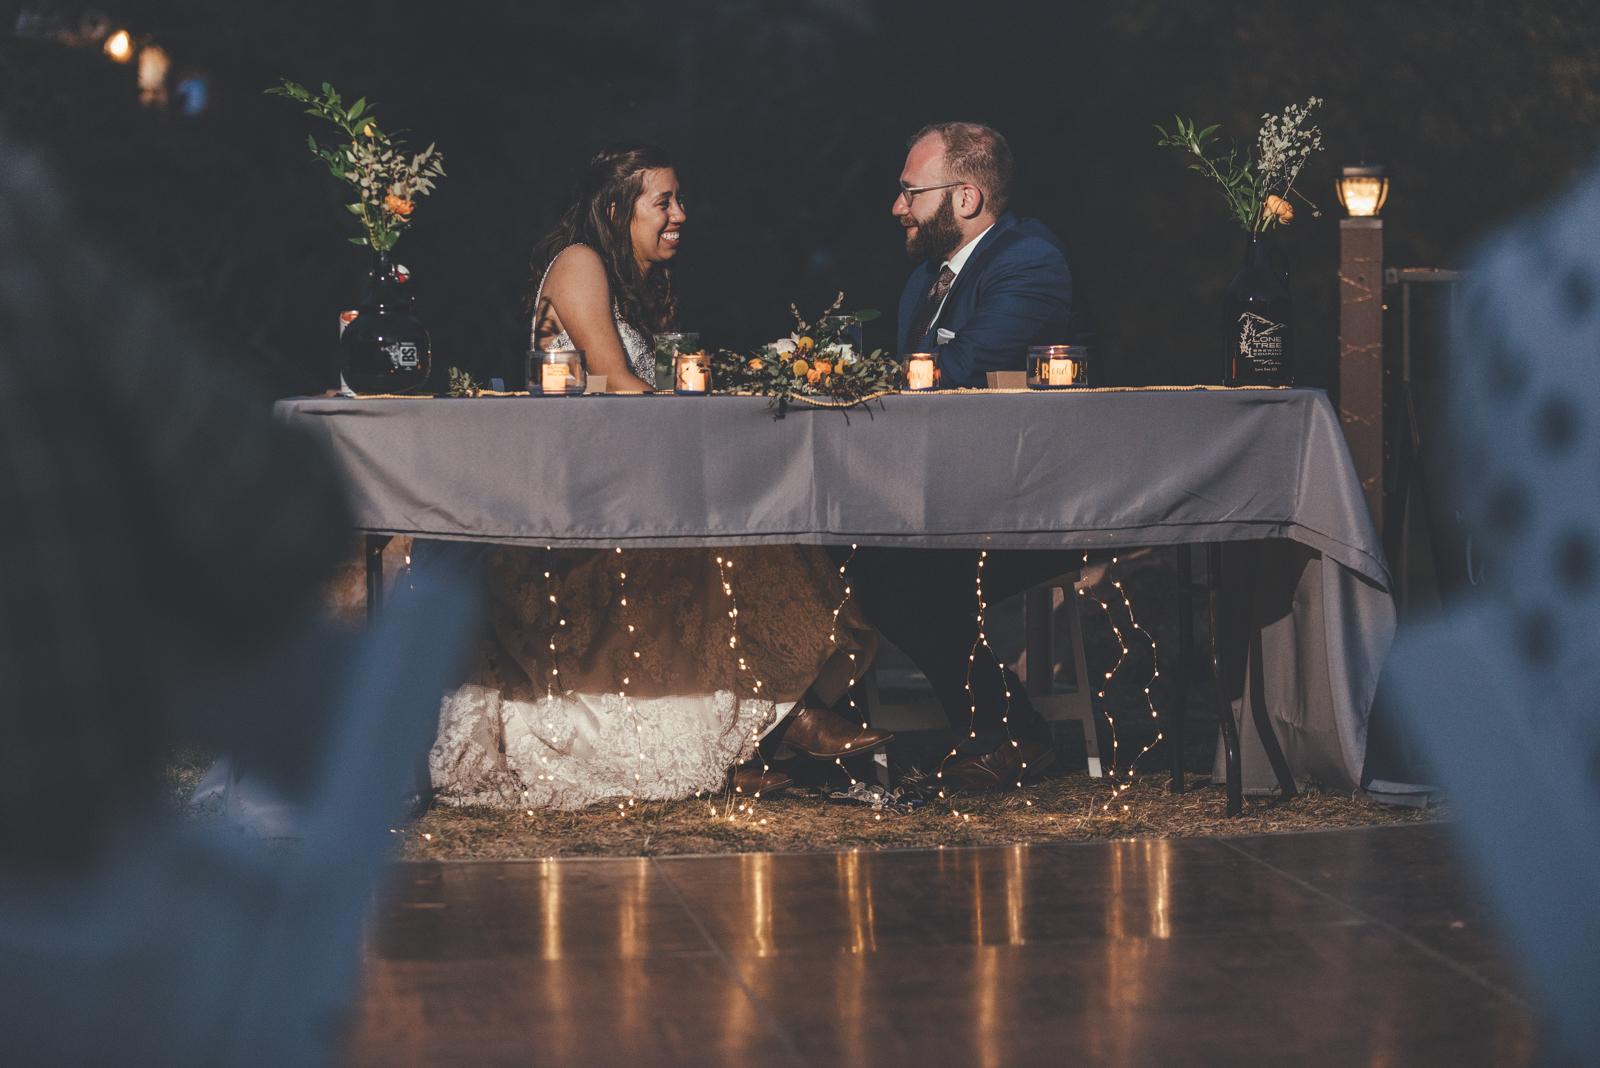 ChadFahnestockPhotography-estes-park-wedding-photography-056.jpg